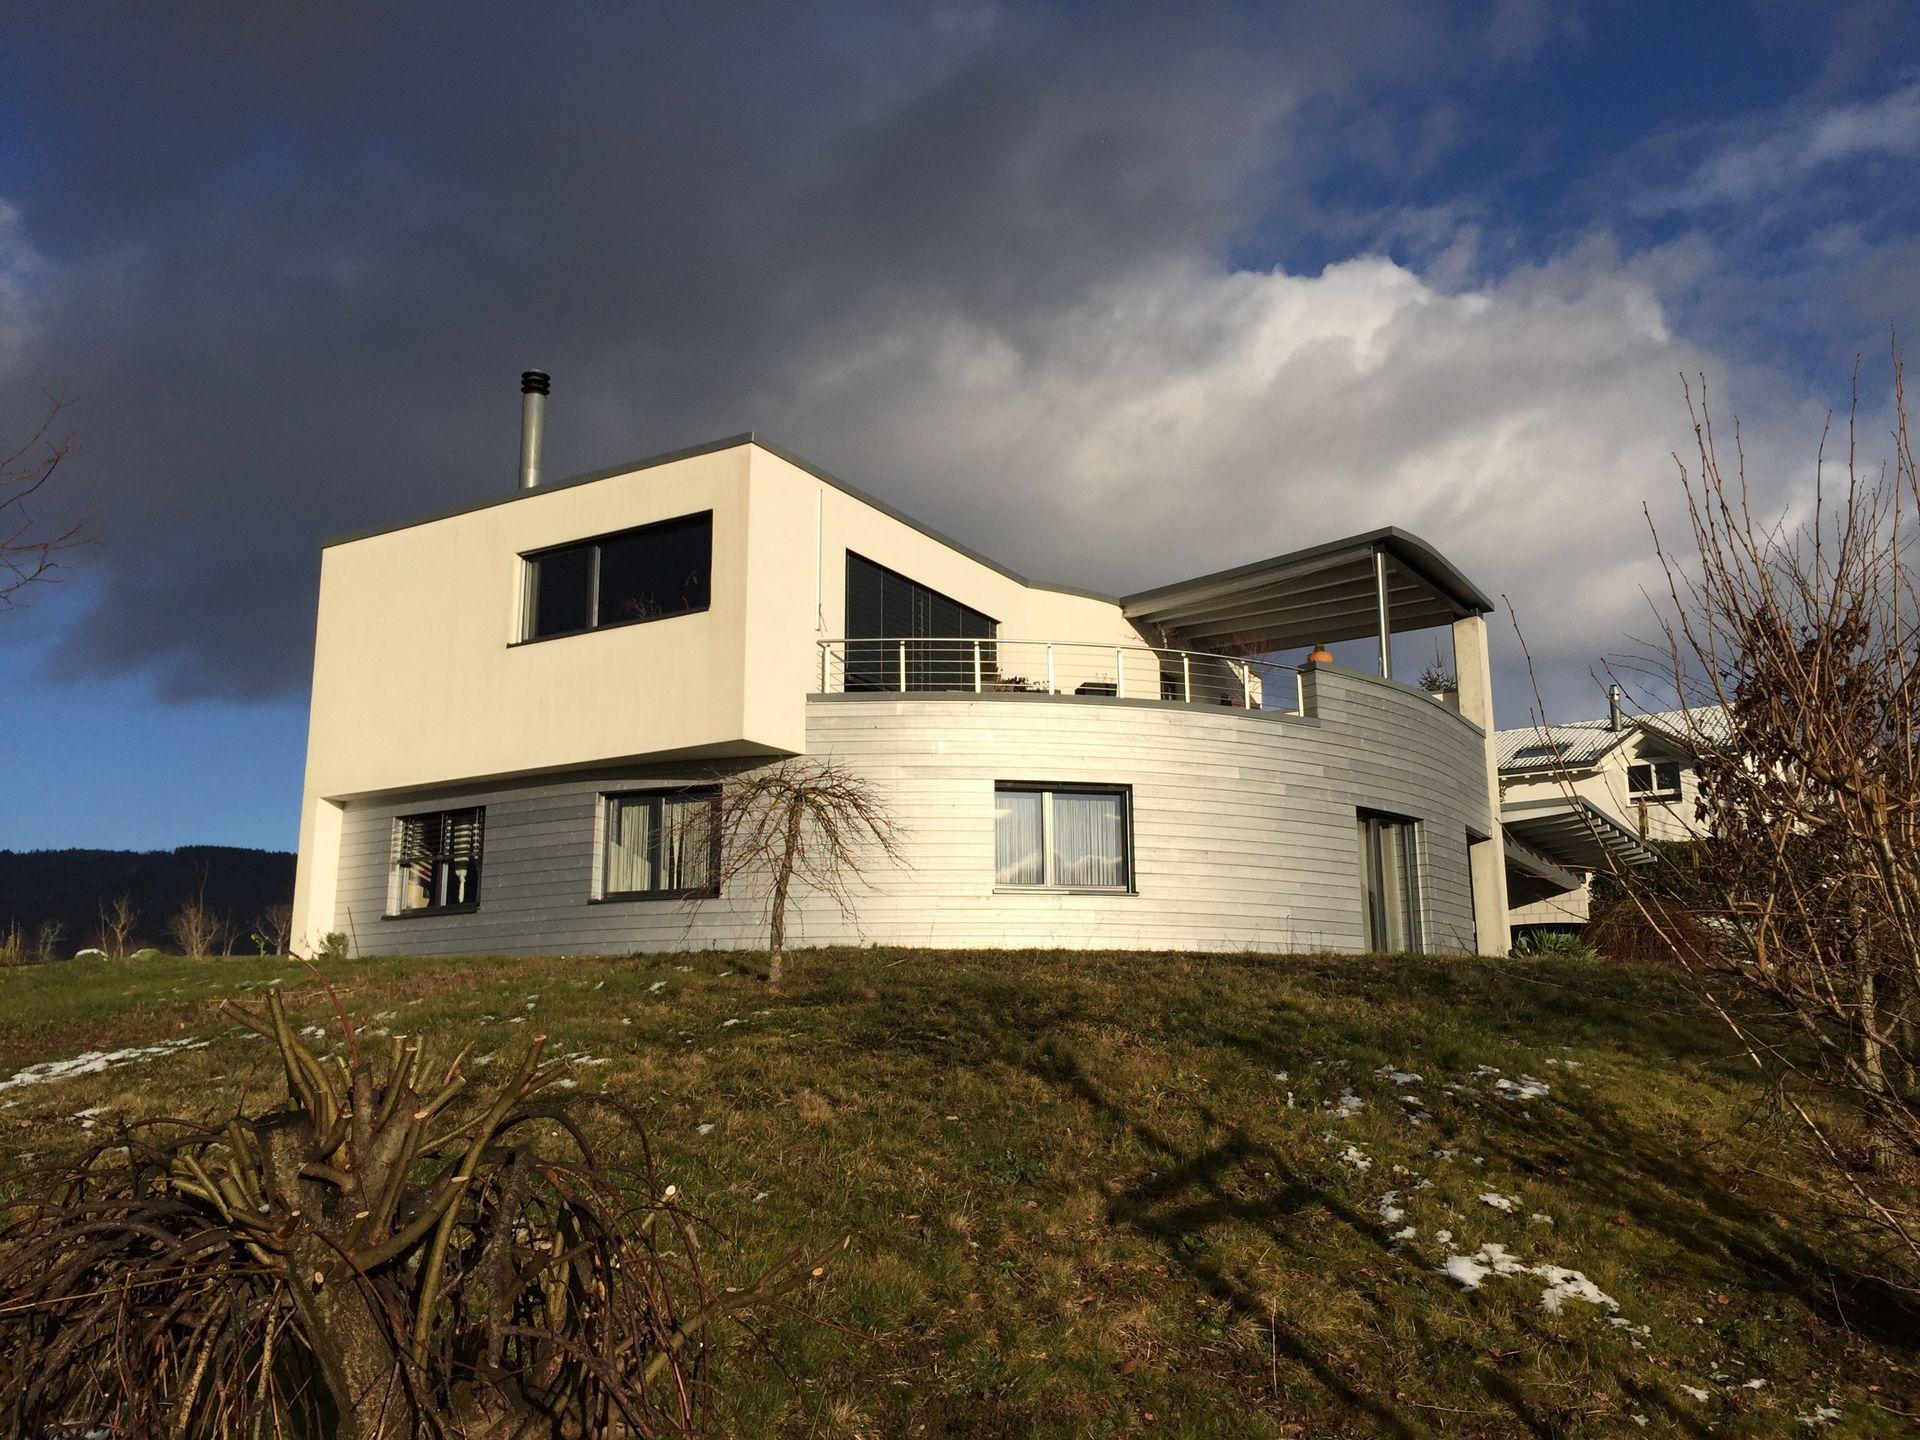 Salle De Bain Jura Suisse ~ maison en suisse jura echange automne 2018 home exchange